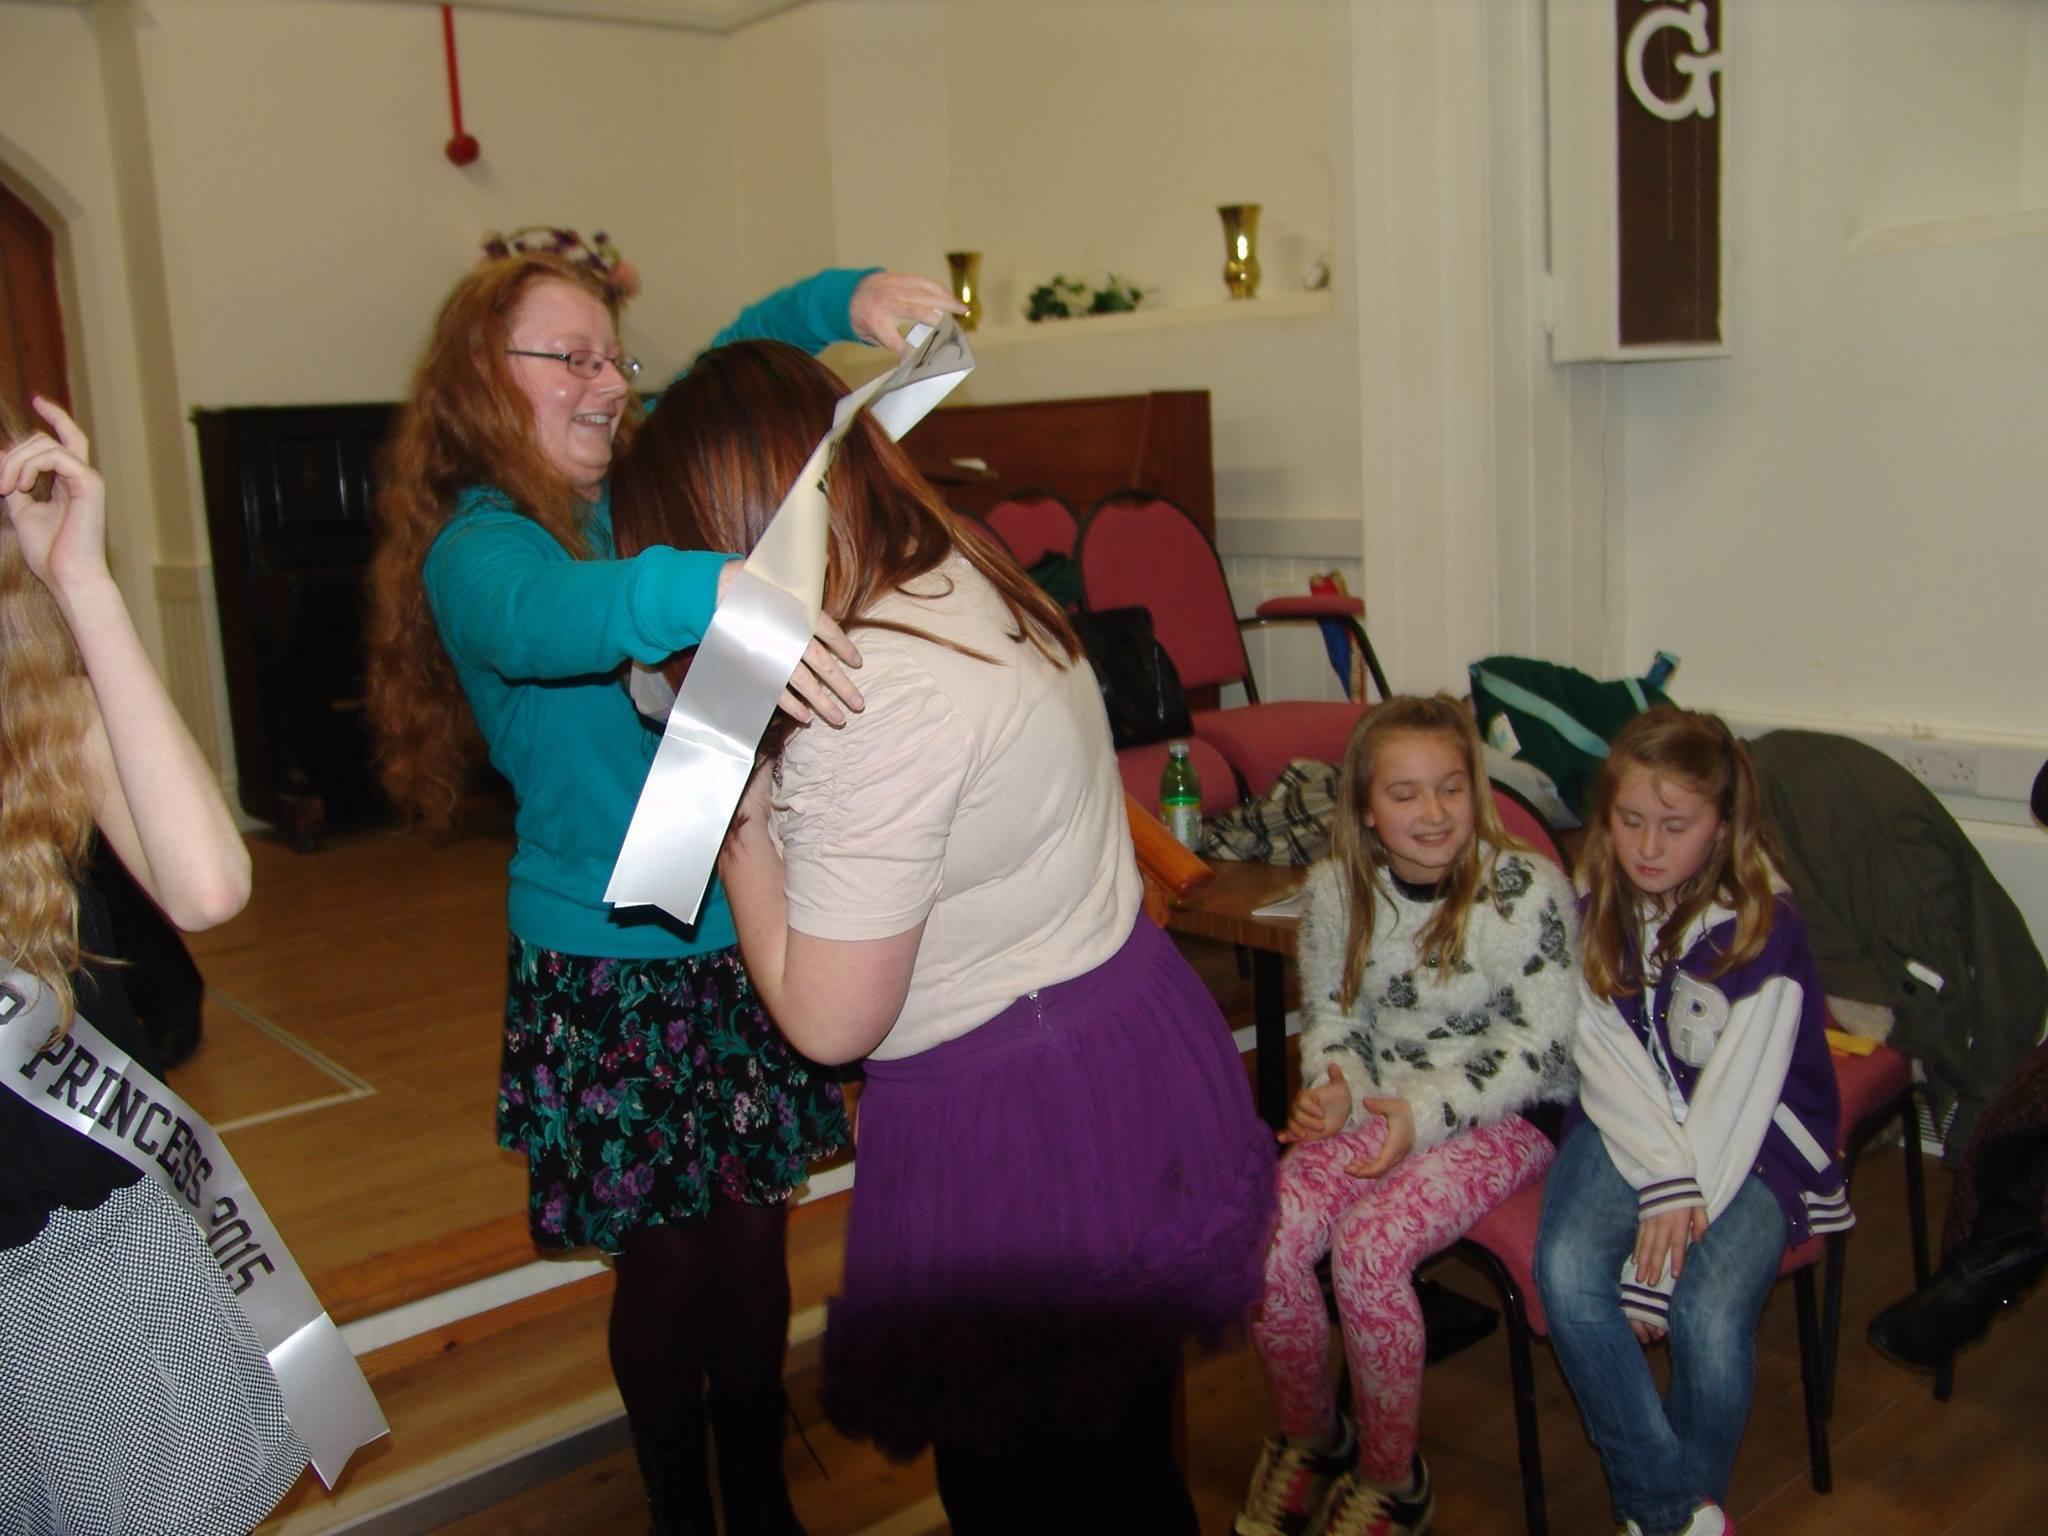 Retiring Queen awarding the new Senior Queen sash